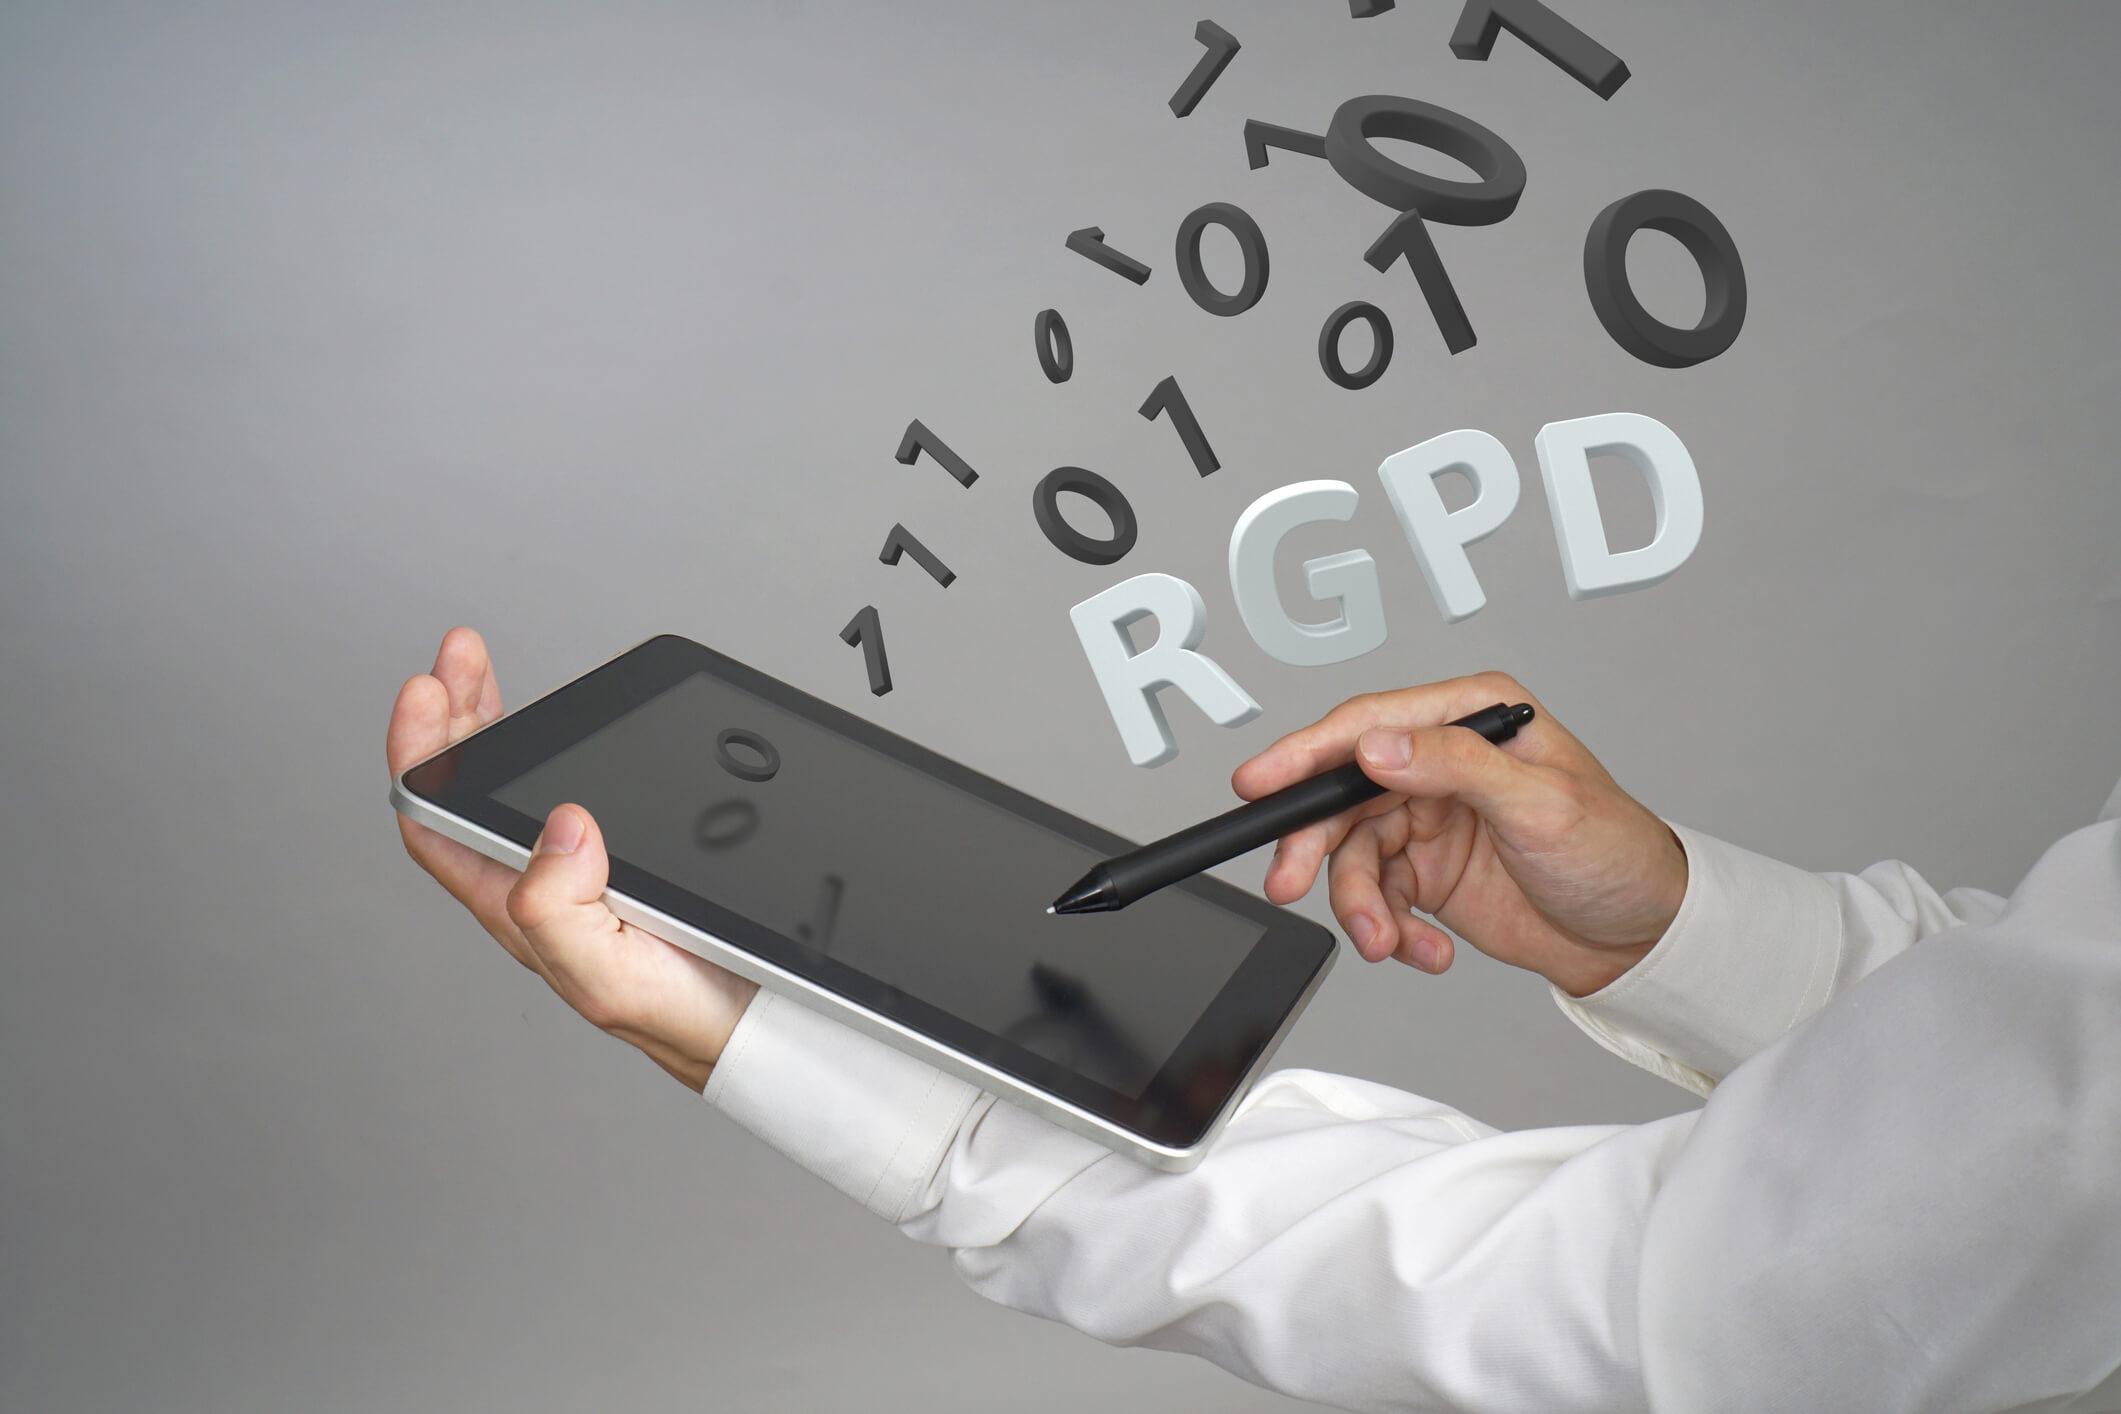 politia privacidad ii thinkstockphotos